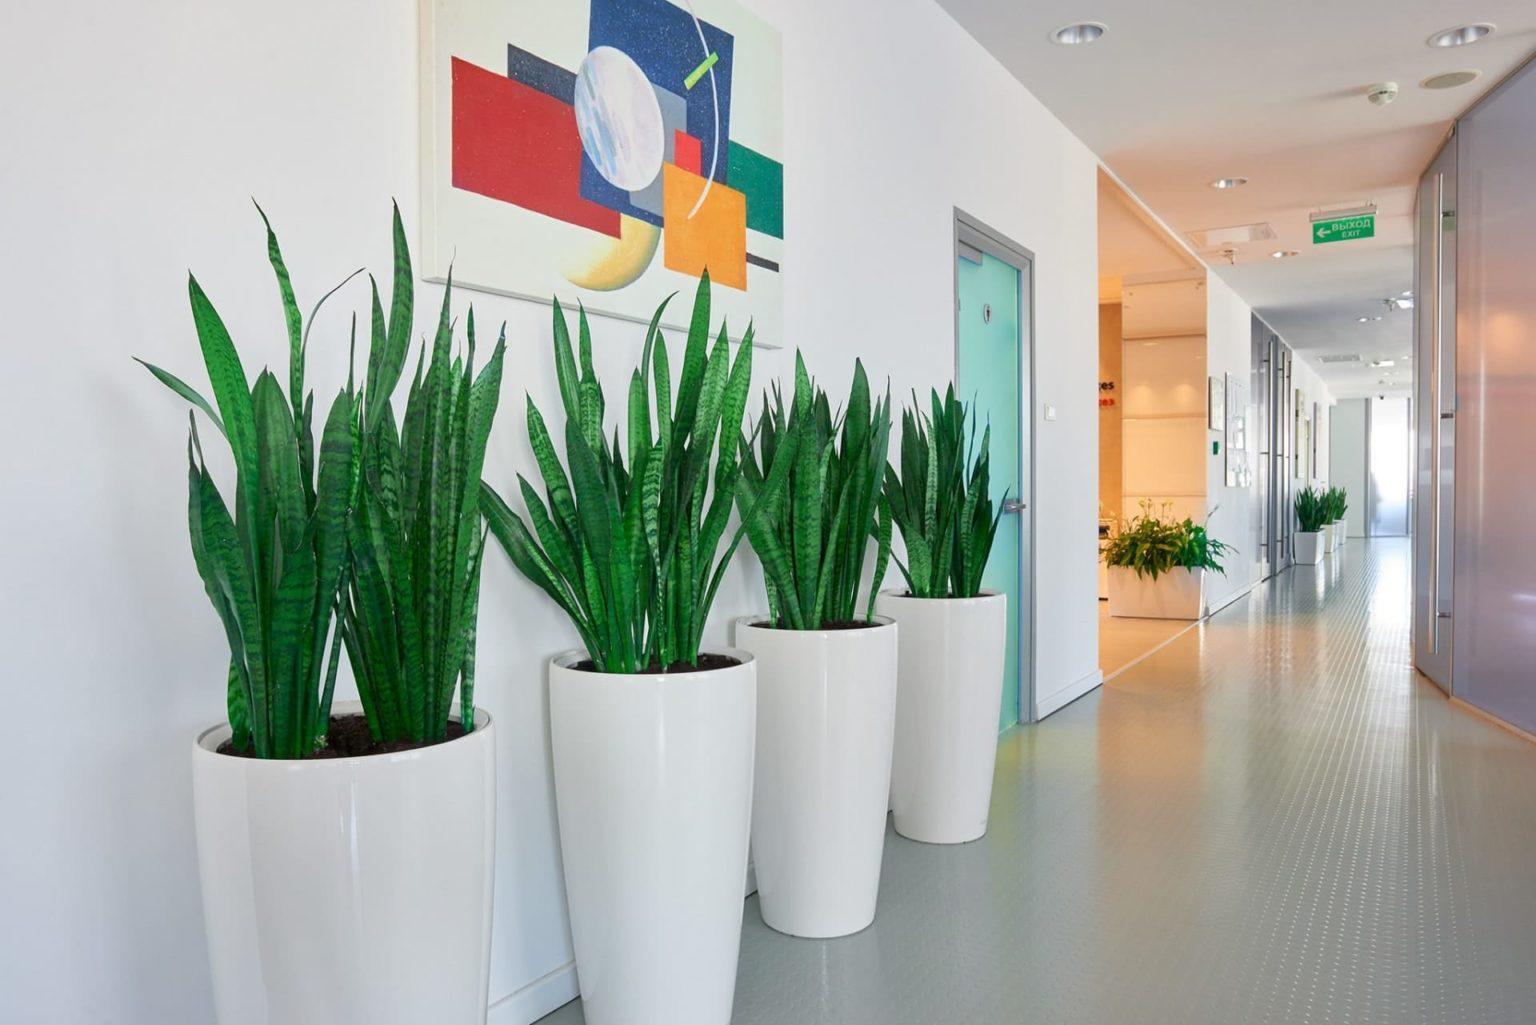 1536x1025 - Озеленение клиники